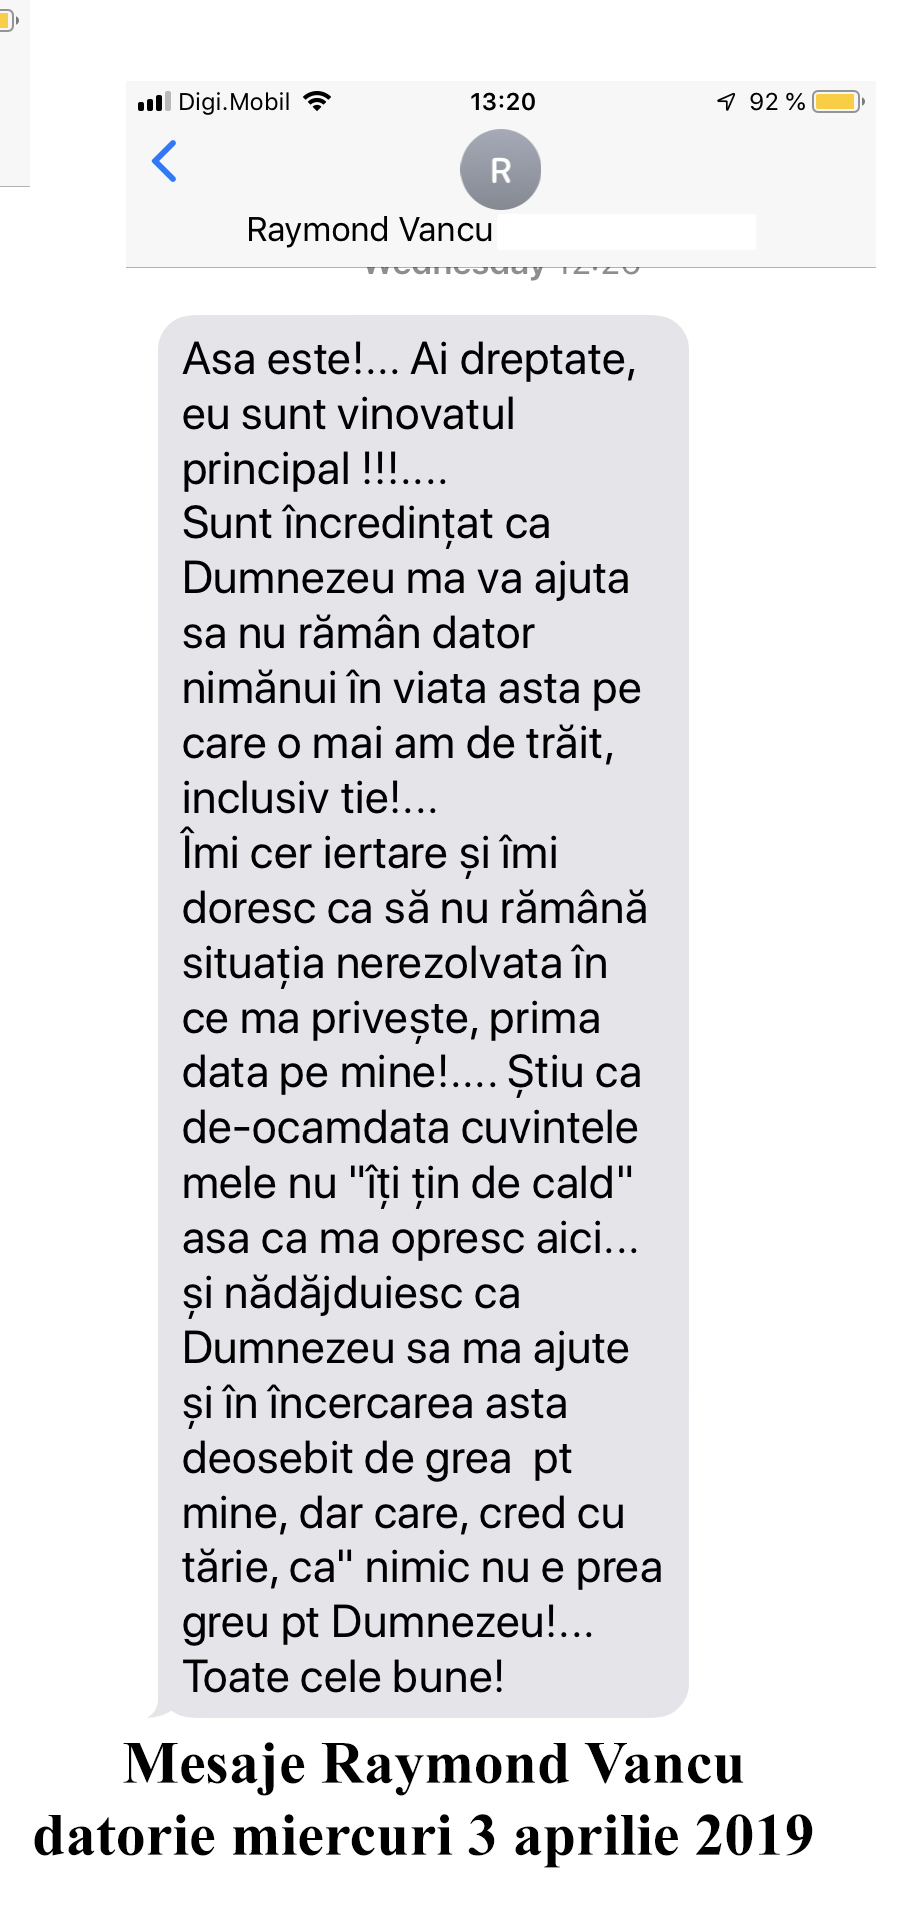 Mesaje Raymond Vancu datorie miercuri 3 aprilie 2019